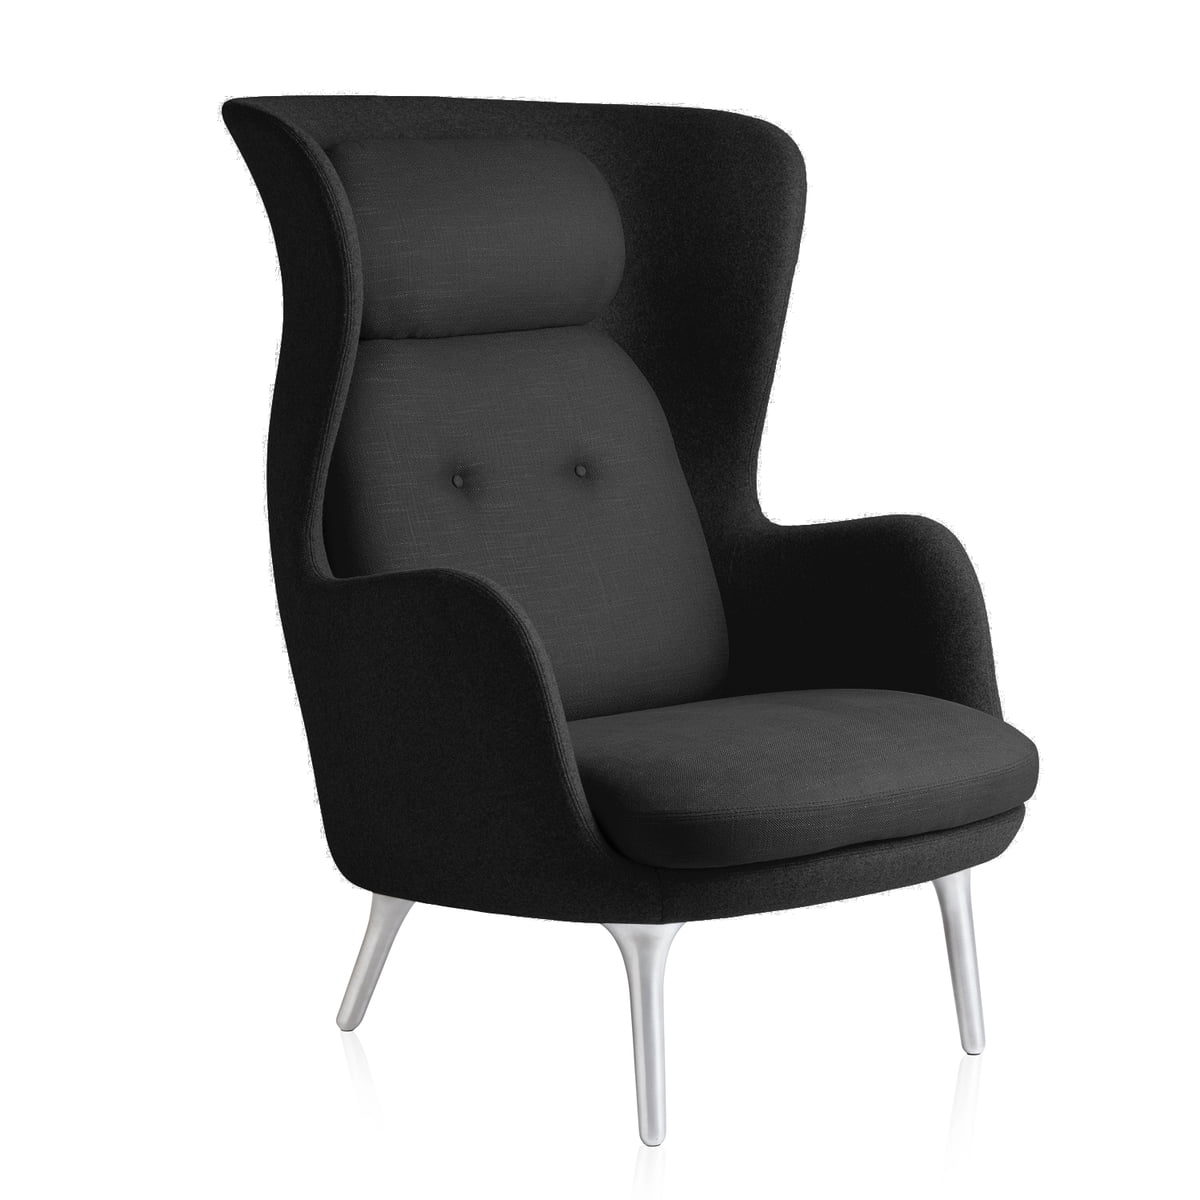 ro sessel von fritz hansen. Black Bedroom Furniture Sets. Home Design Ideas